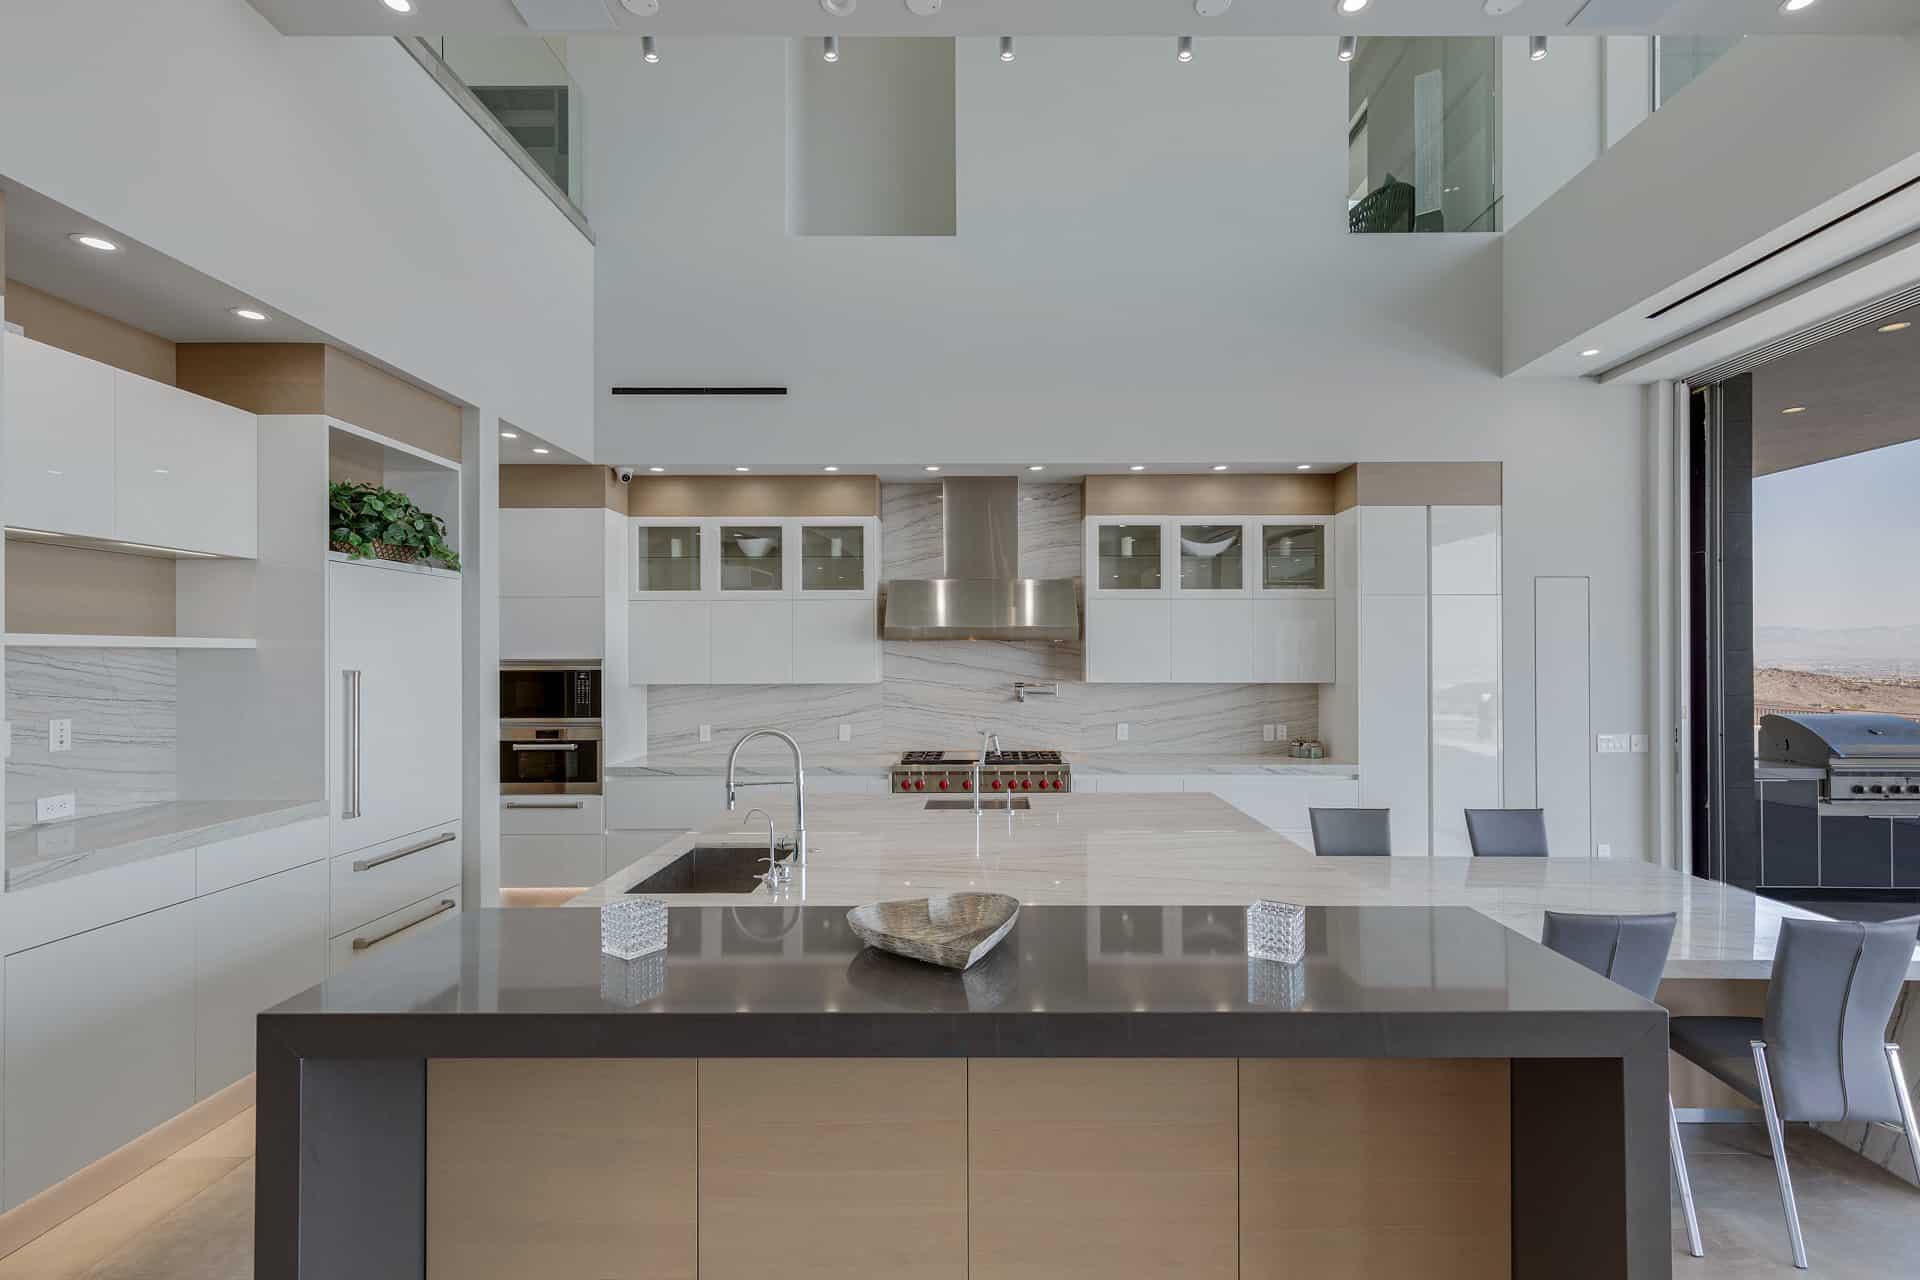 las-vegas-luxry-real-estate-realtor-rob-jensen-company-5-rockstream-drive-ascaya031